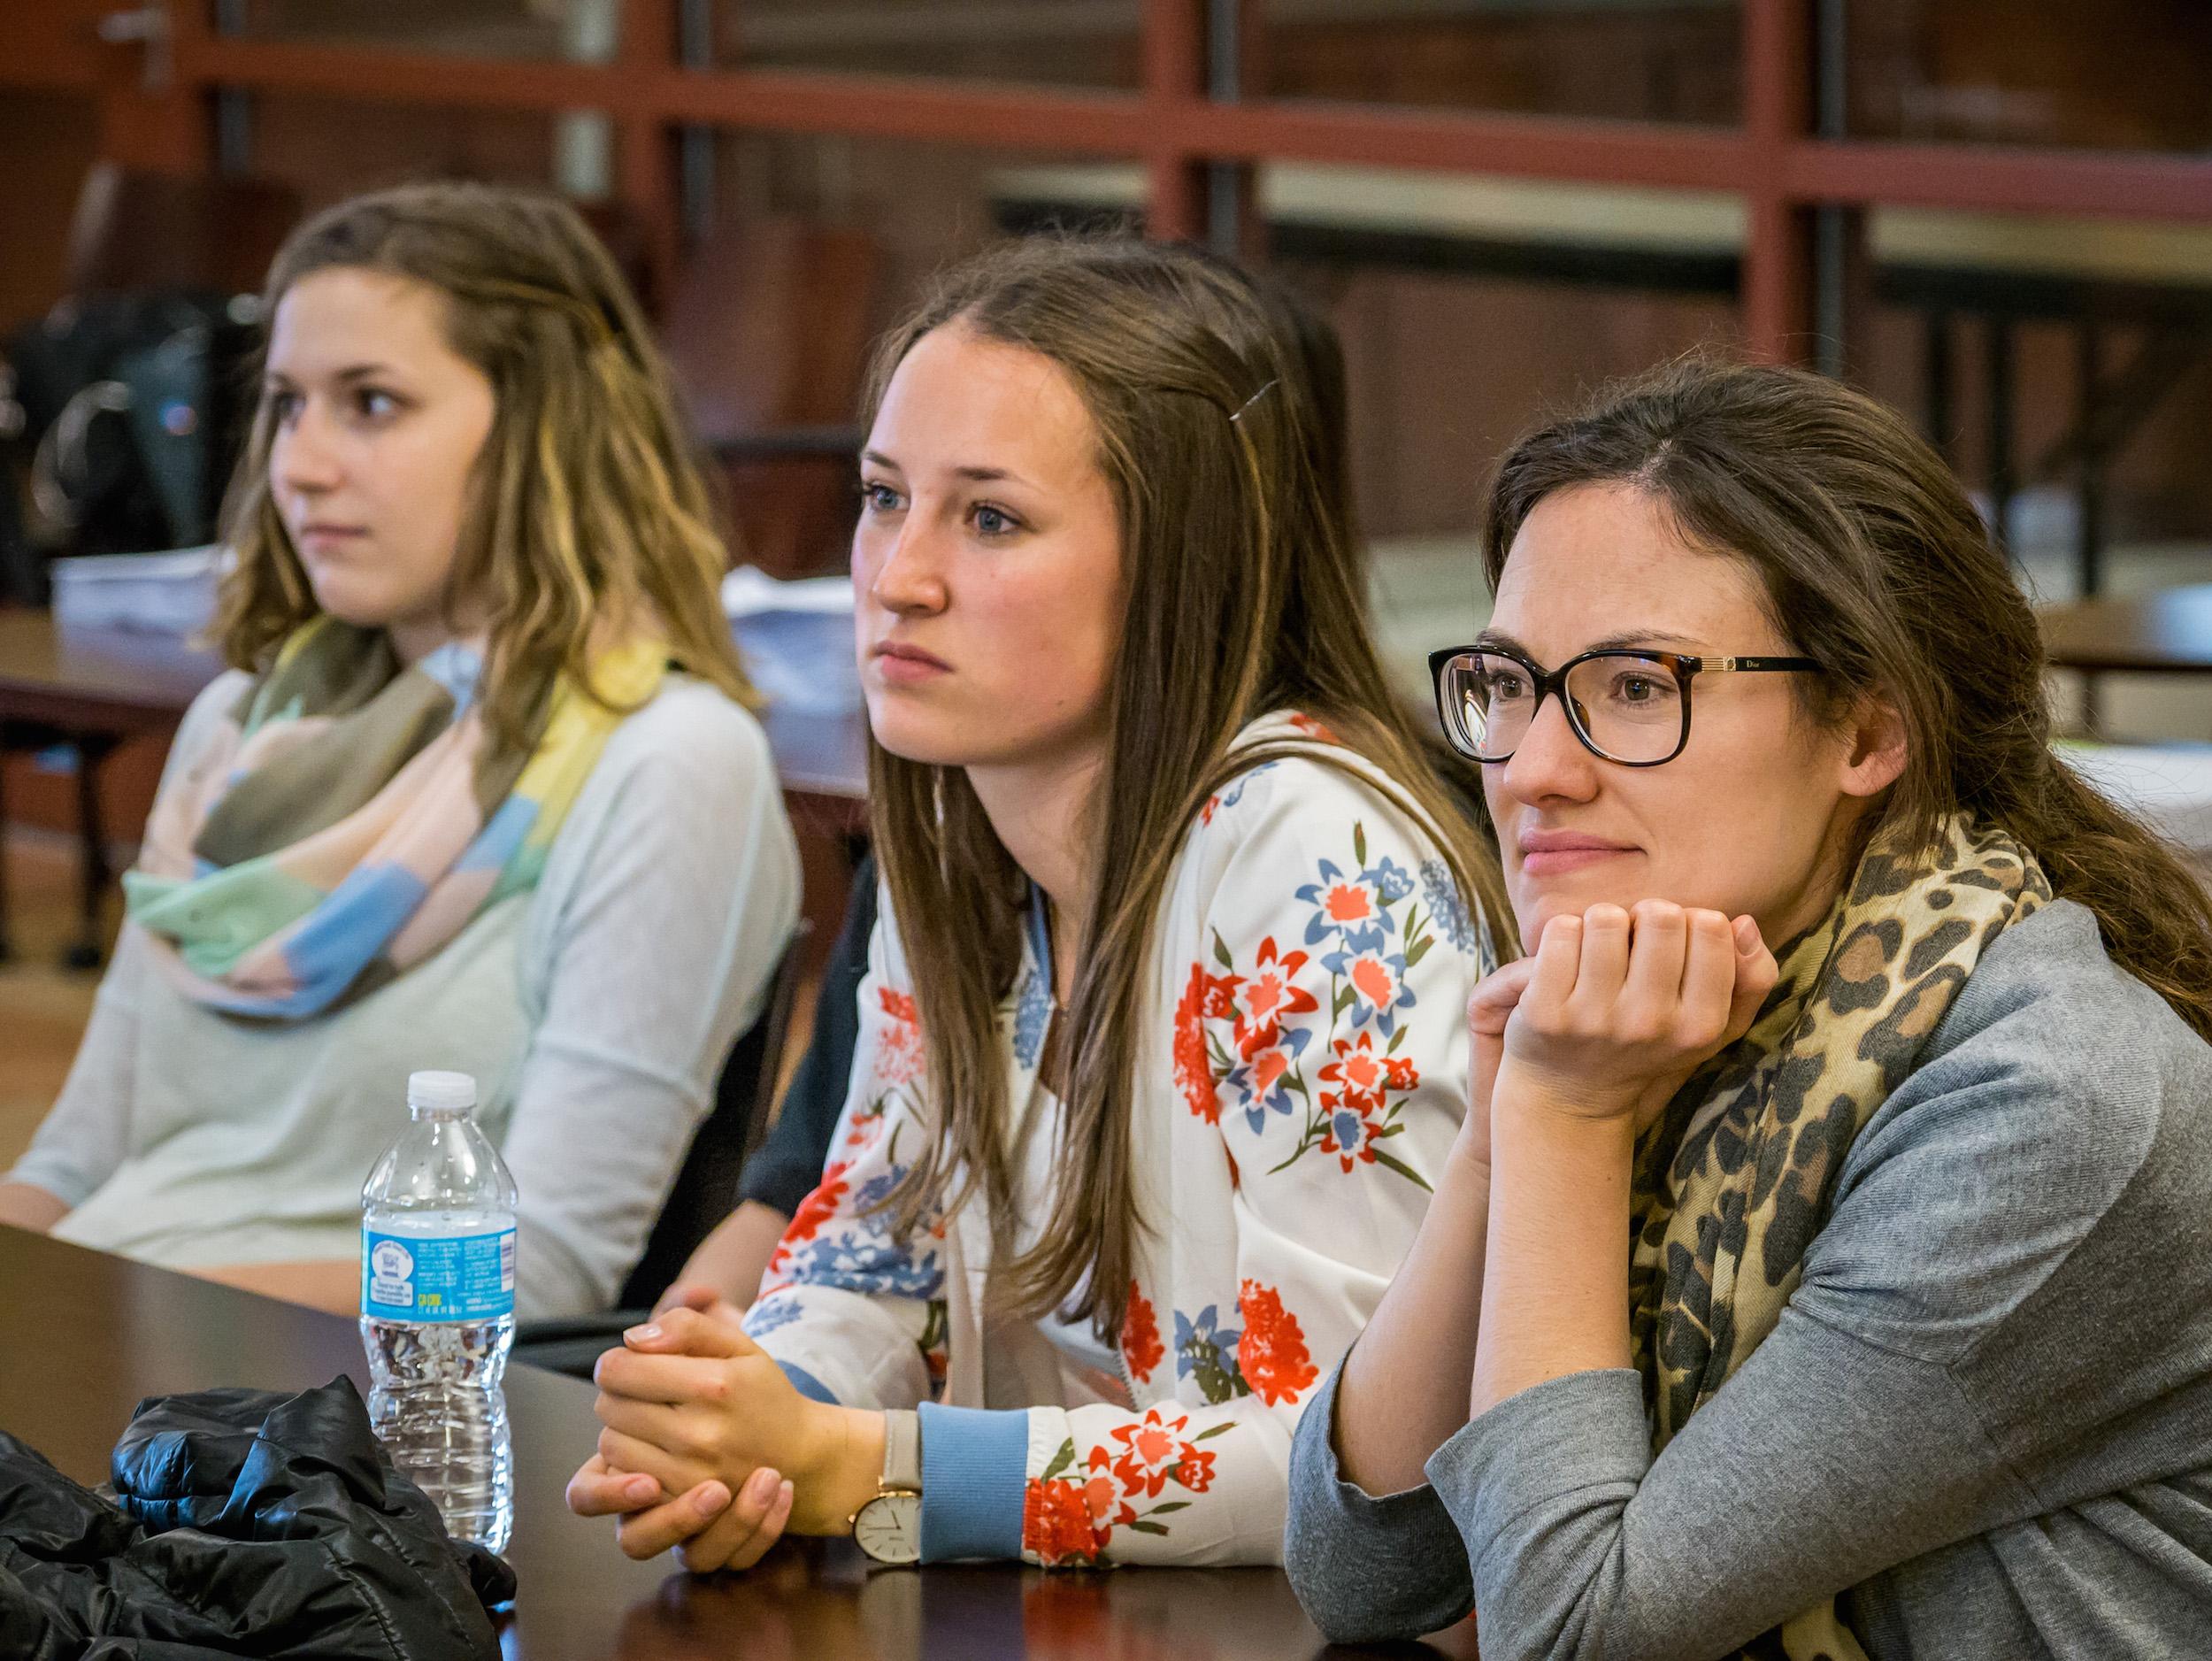 TEA Students engaged in Innovation - MSU 2017.jpg